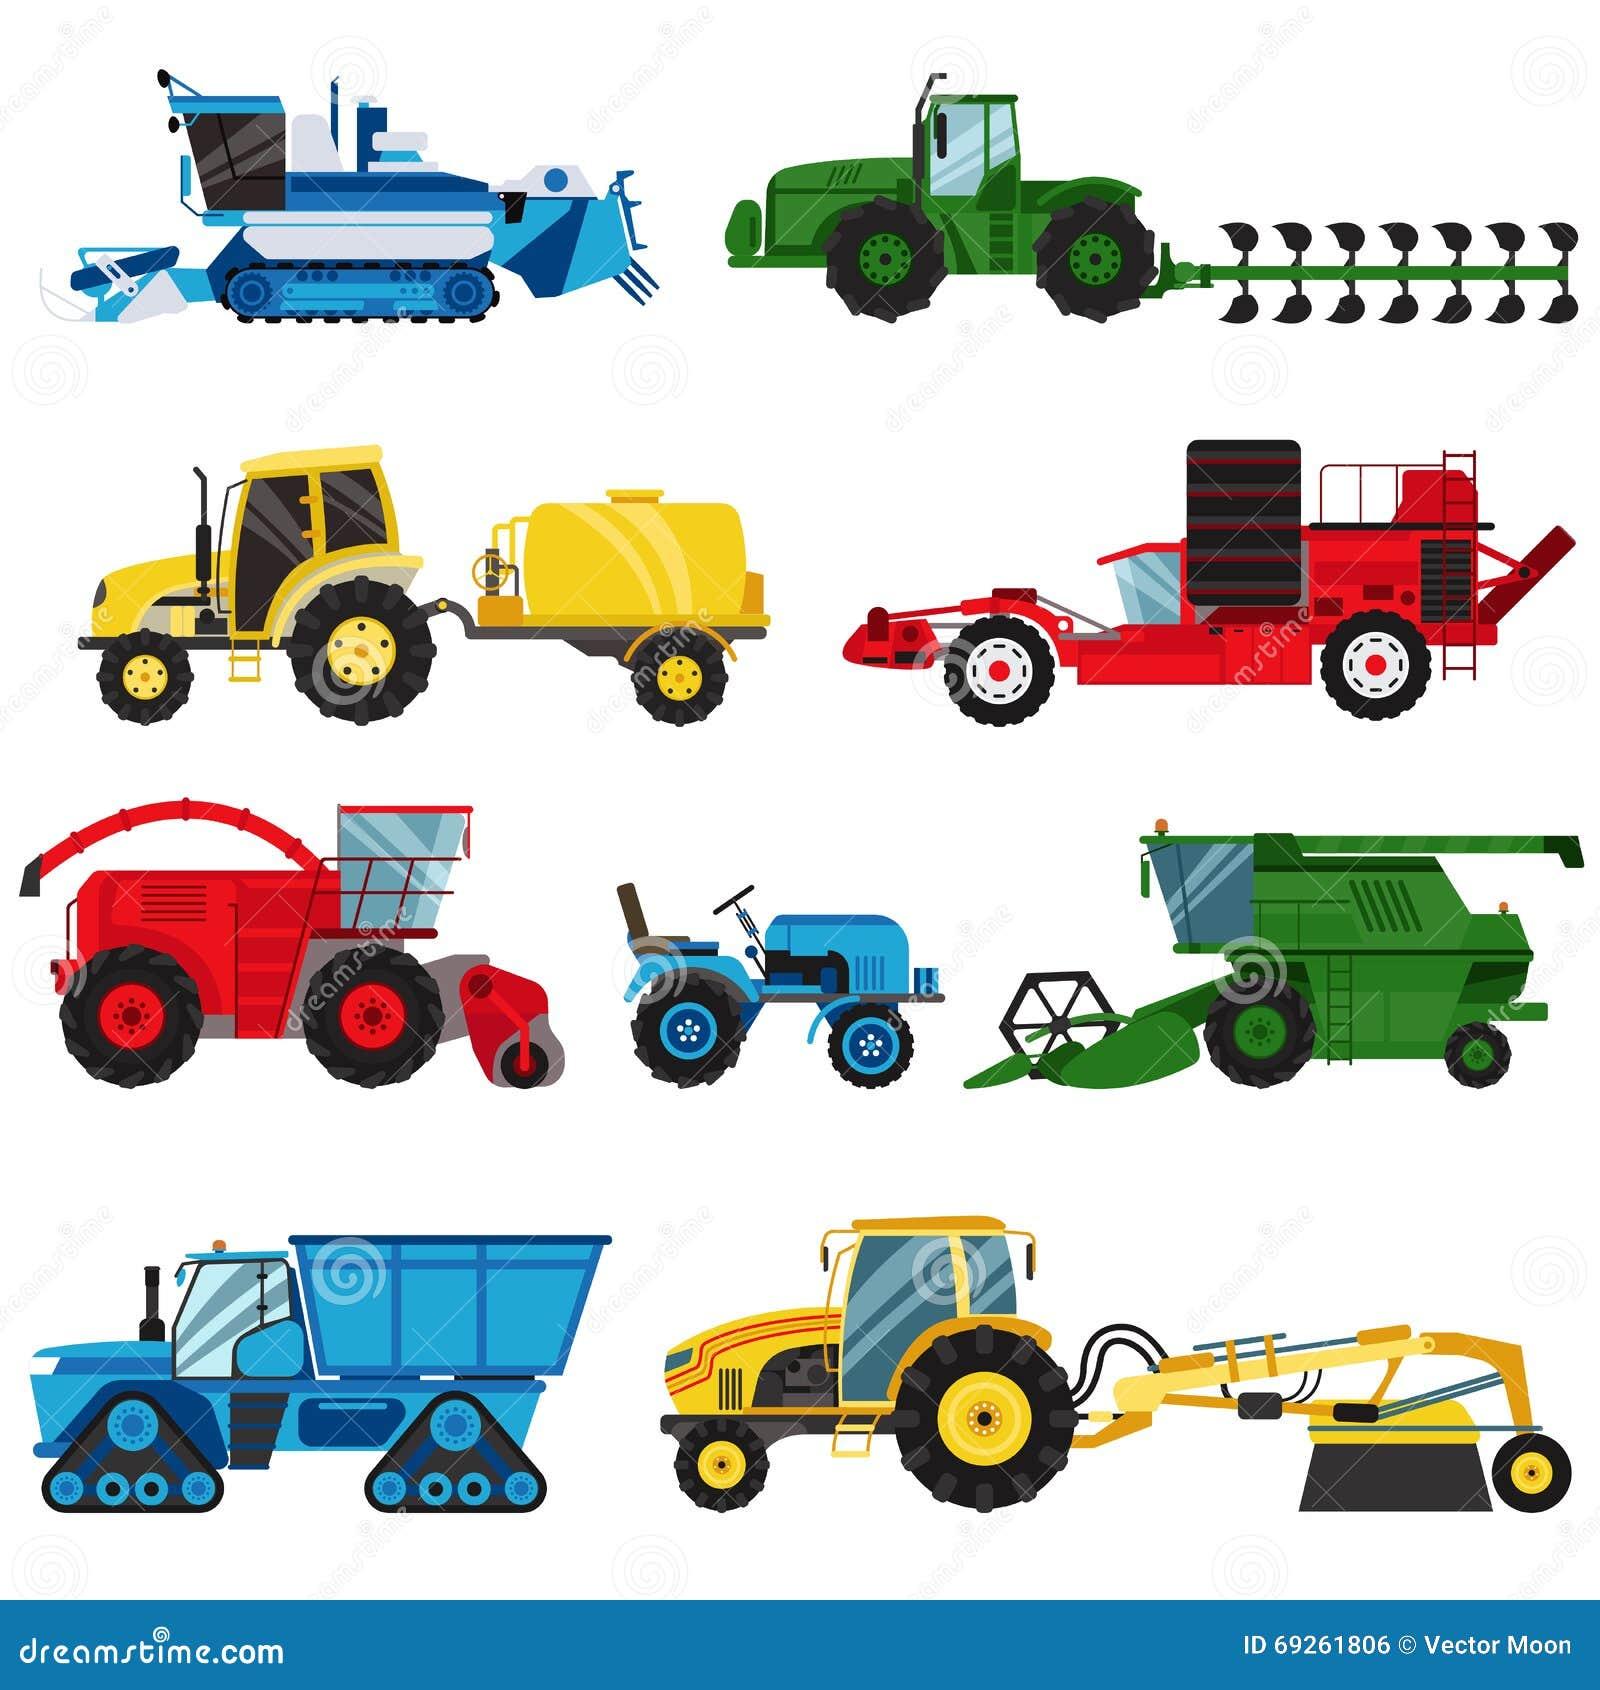 Farm Machinery And Equipment : Excavators cartoons illustrations vector stock images